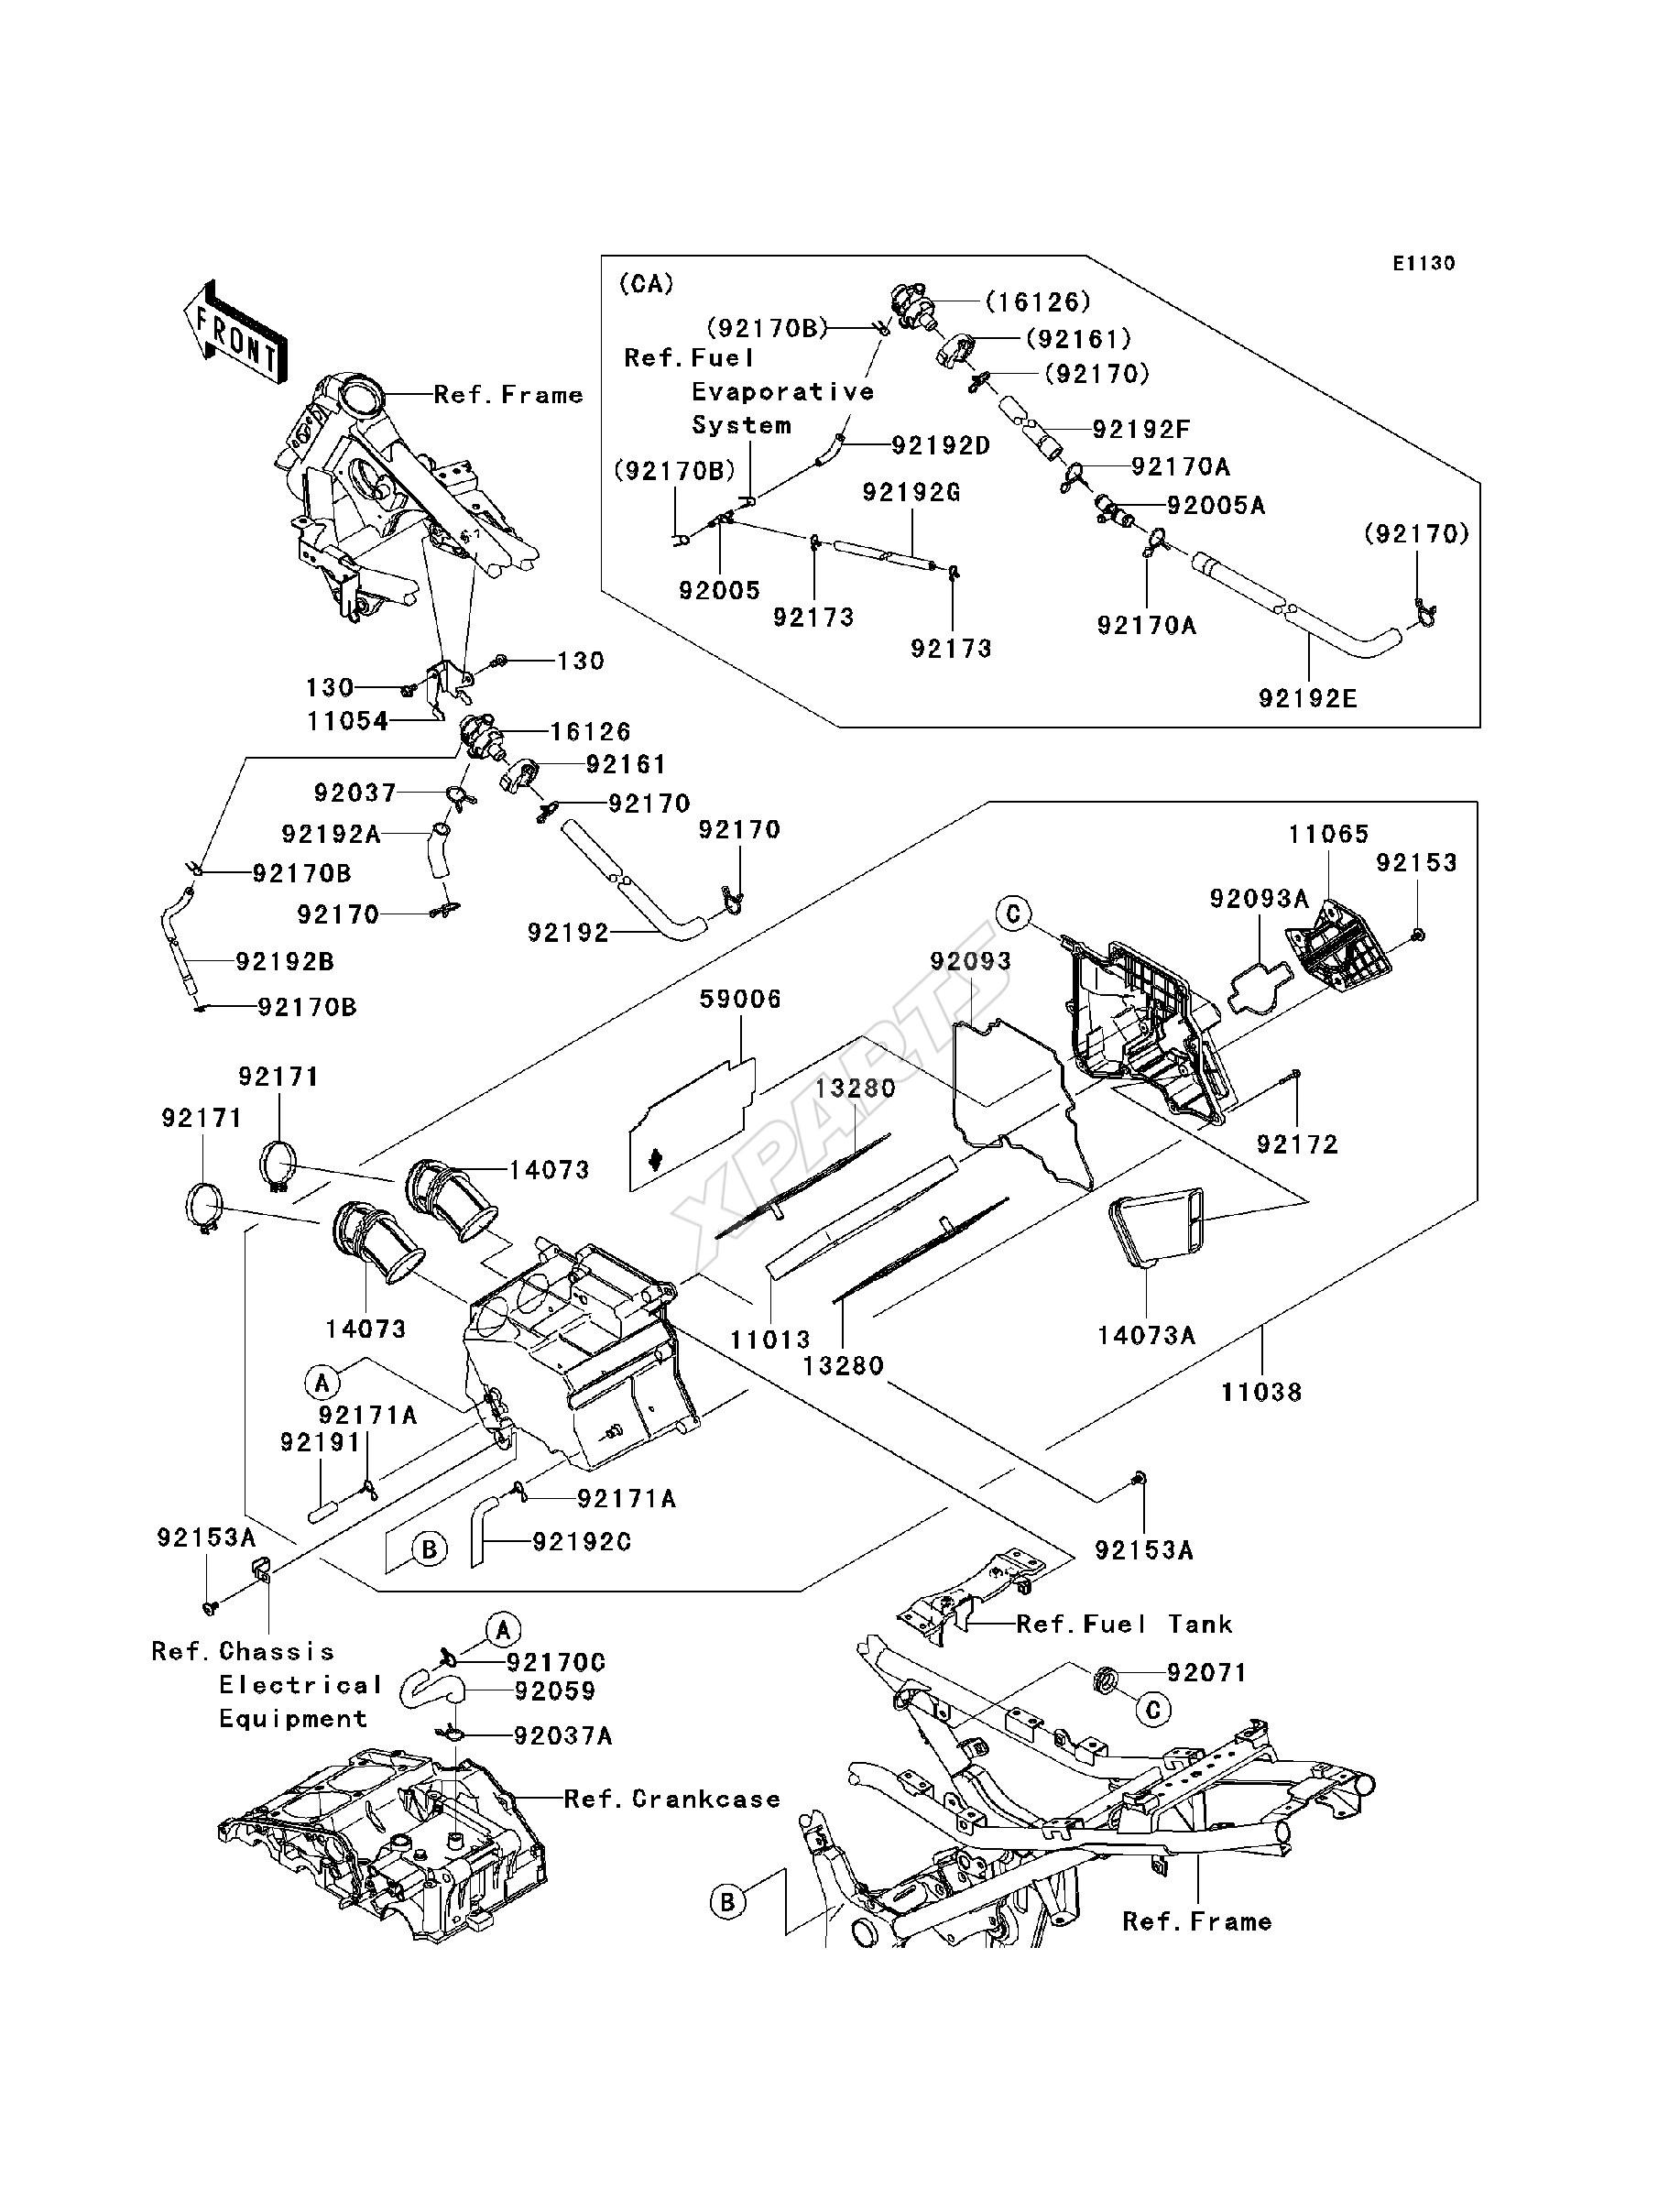 2010 Ninja 250r Ex250 Jafa Engine Diagram 1985 900 Bild Fr Kategorie Air Cleaner